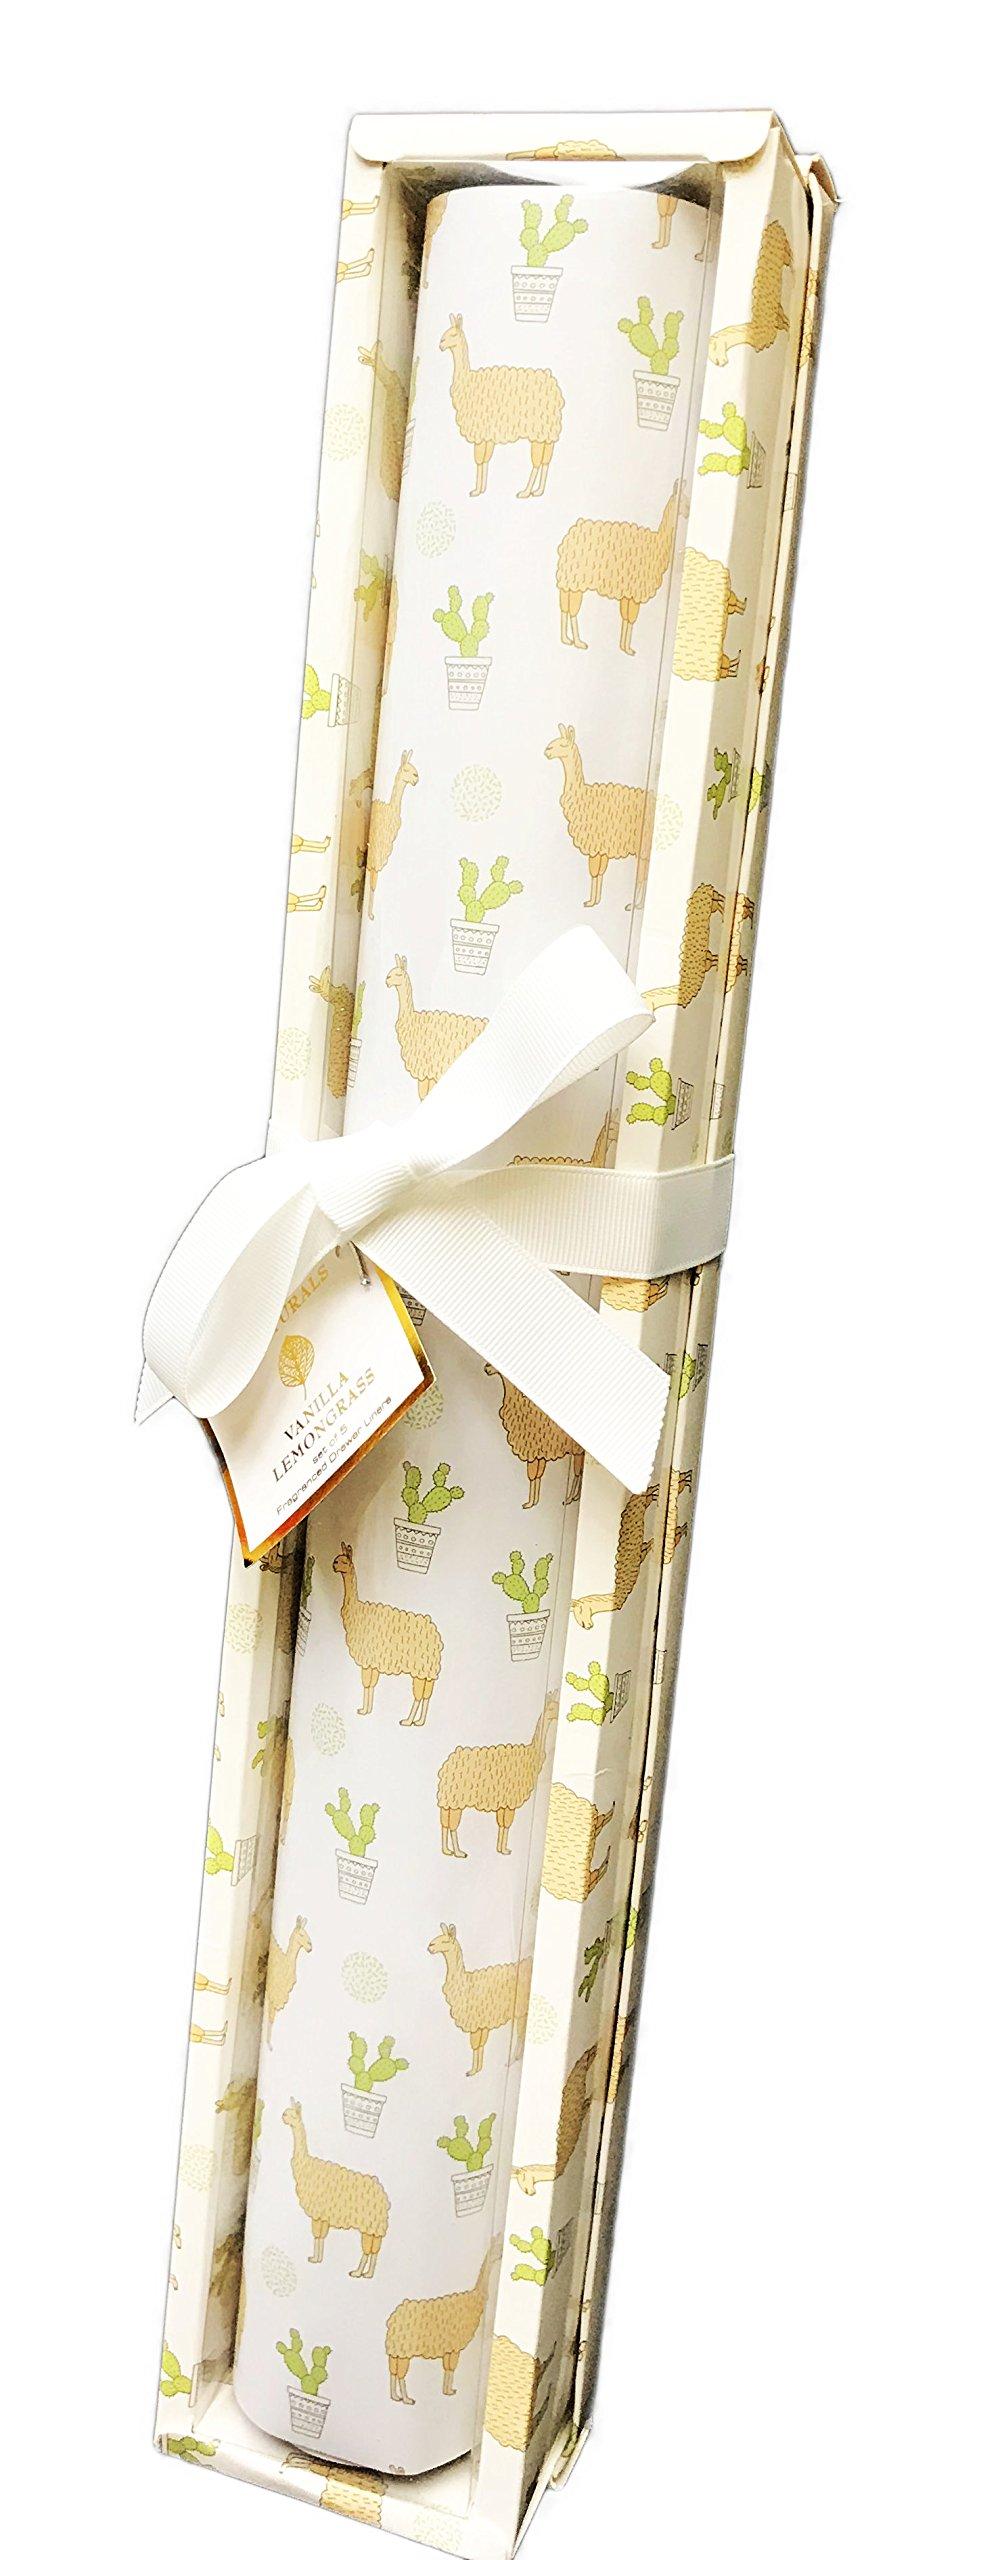 GC Naturals Whimsical Desert Llama's & Cacti Set of 5 Fragranced Drawer Liners (Vanilla Lemongrass)